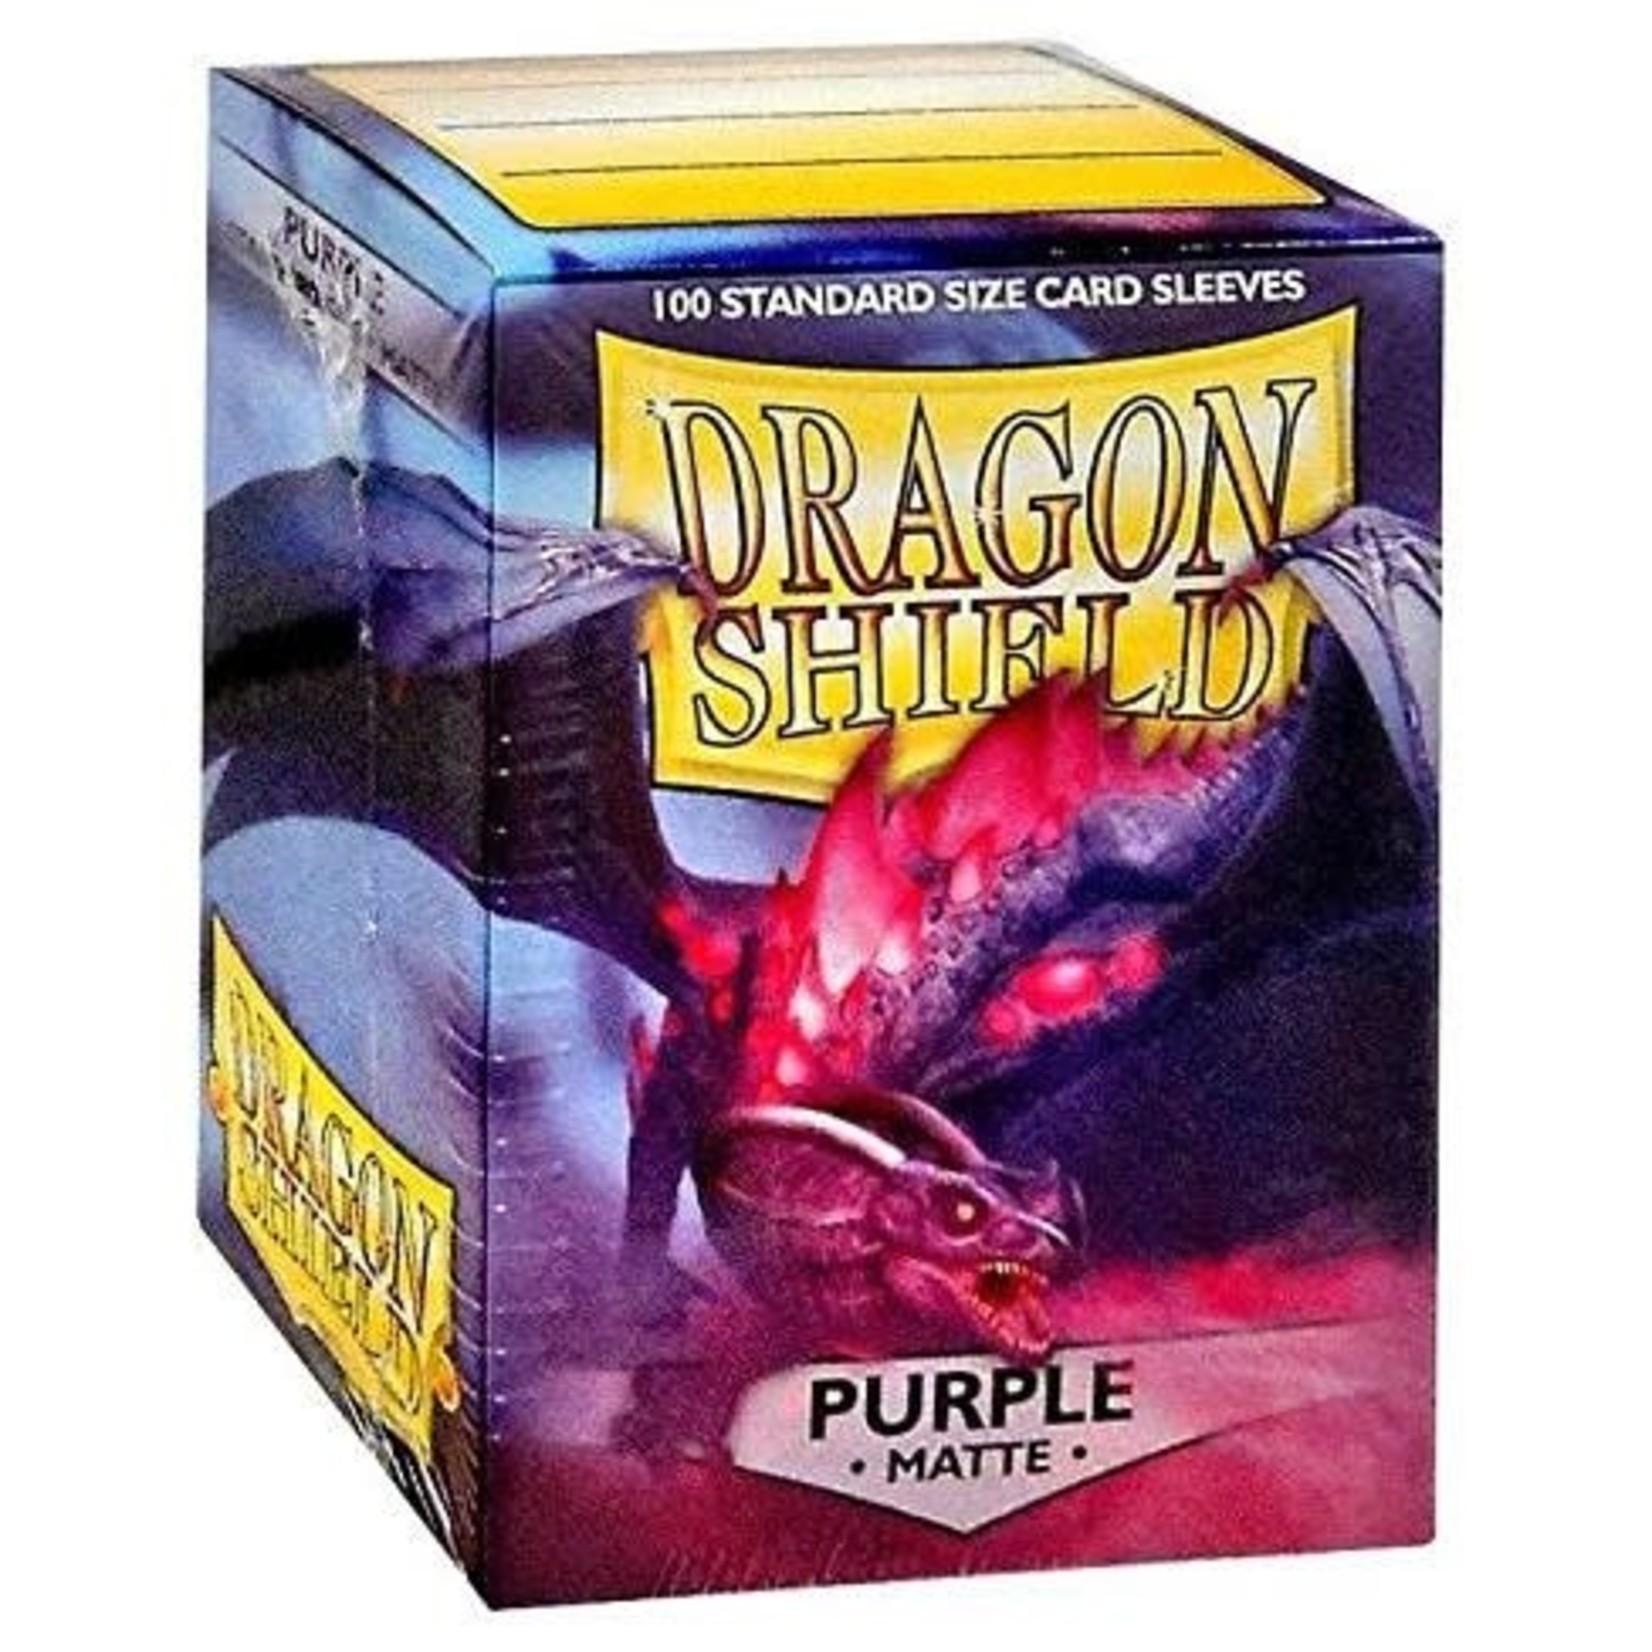 Dragon Shield Dragon Shield Matte Purple Card Sleeves (100)